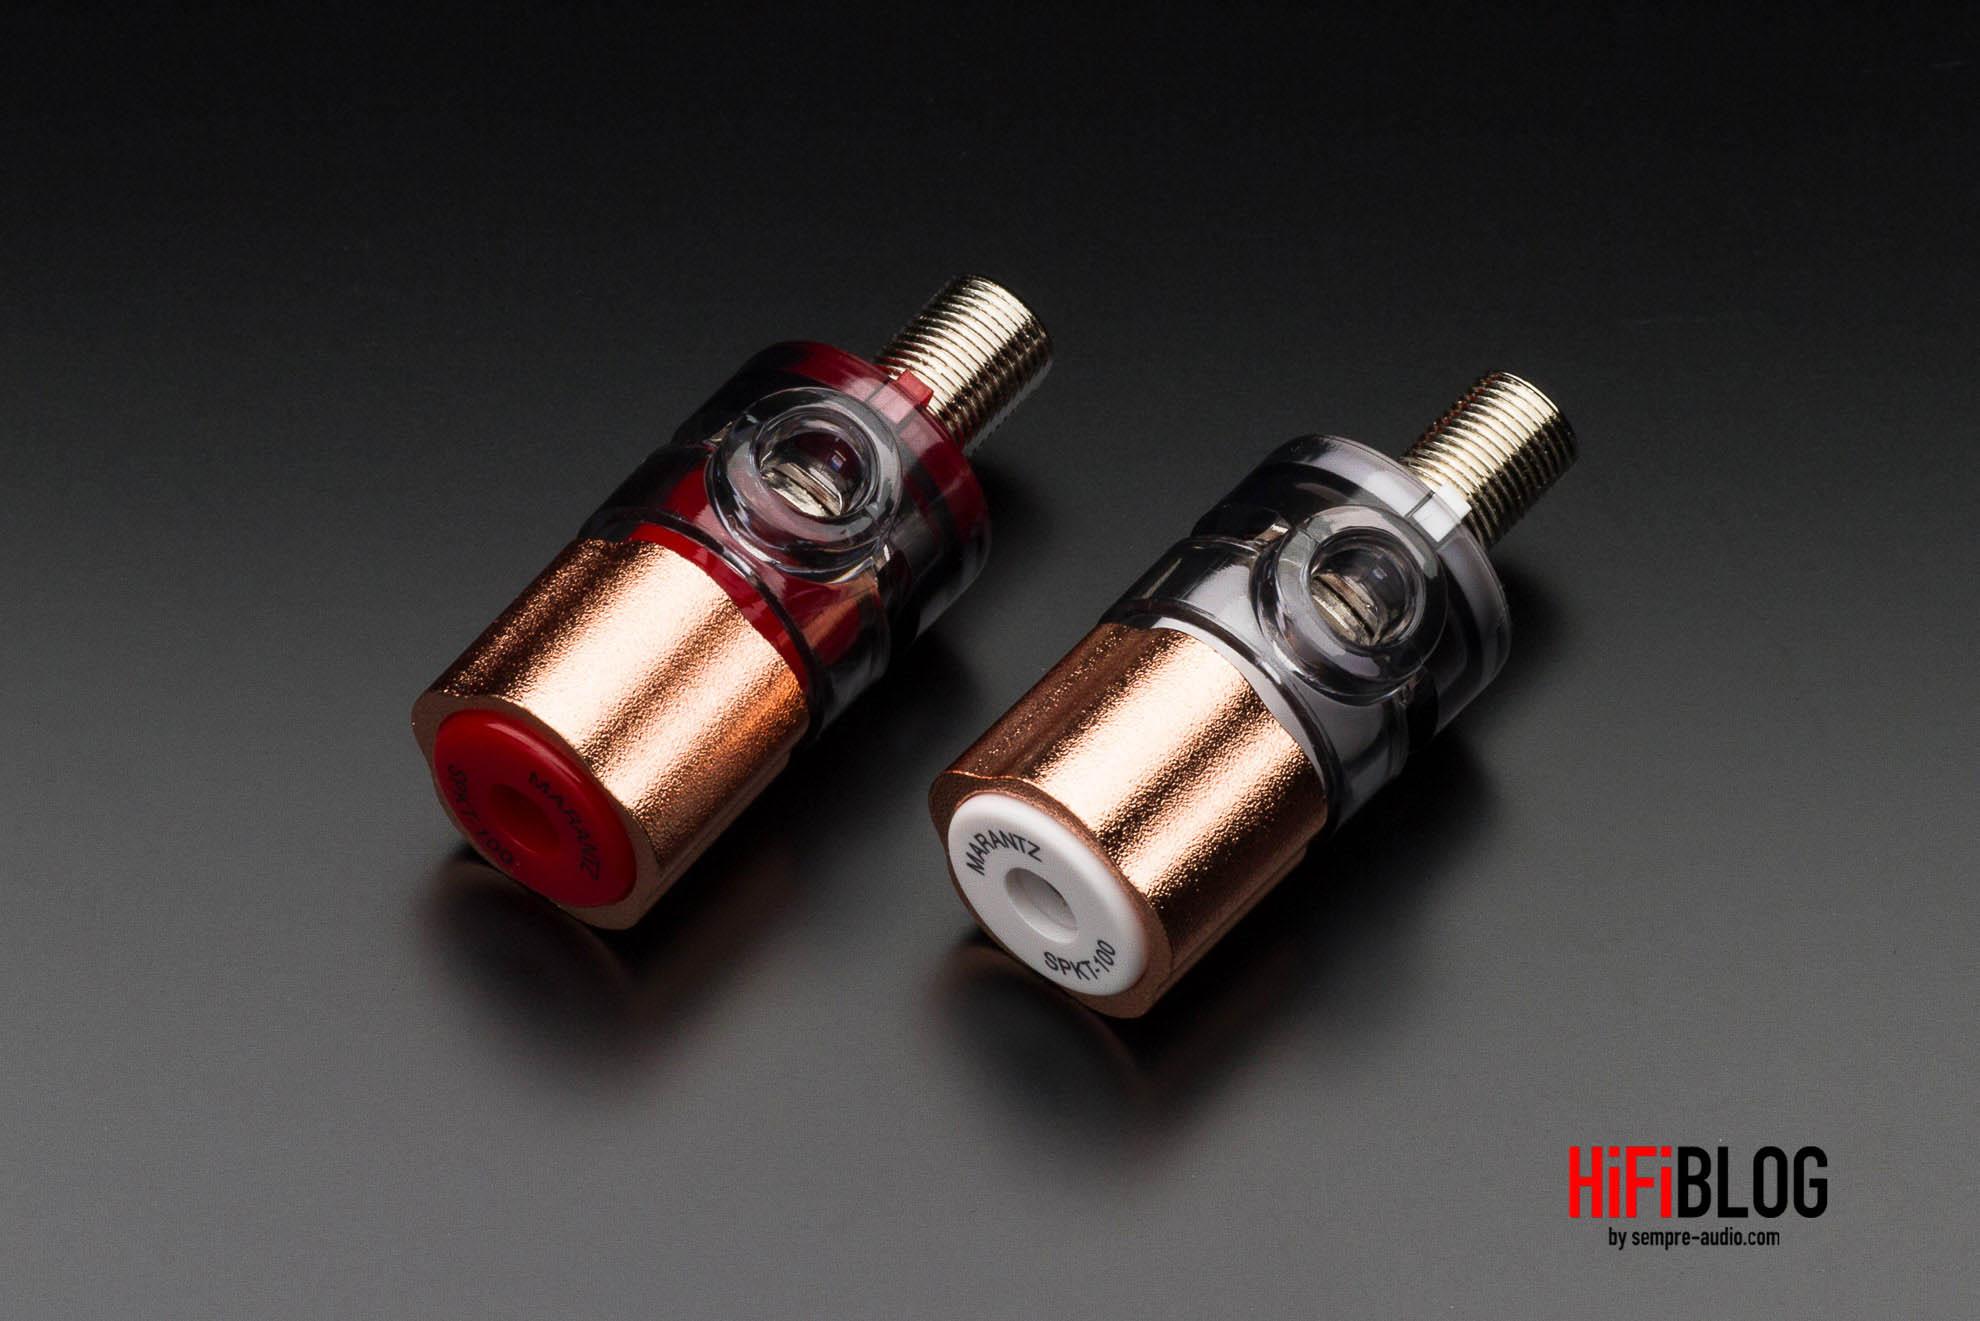 Marantz Model 30 Integrated Amplifier and SACD 30n Network SACD Player 23